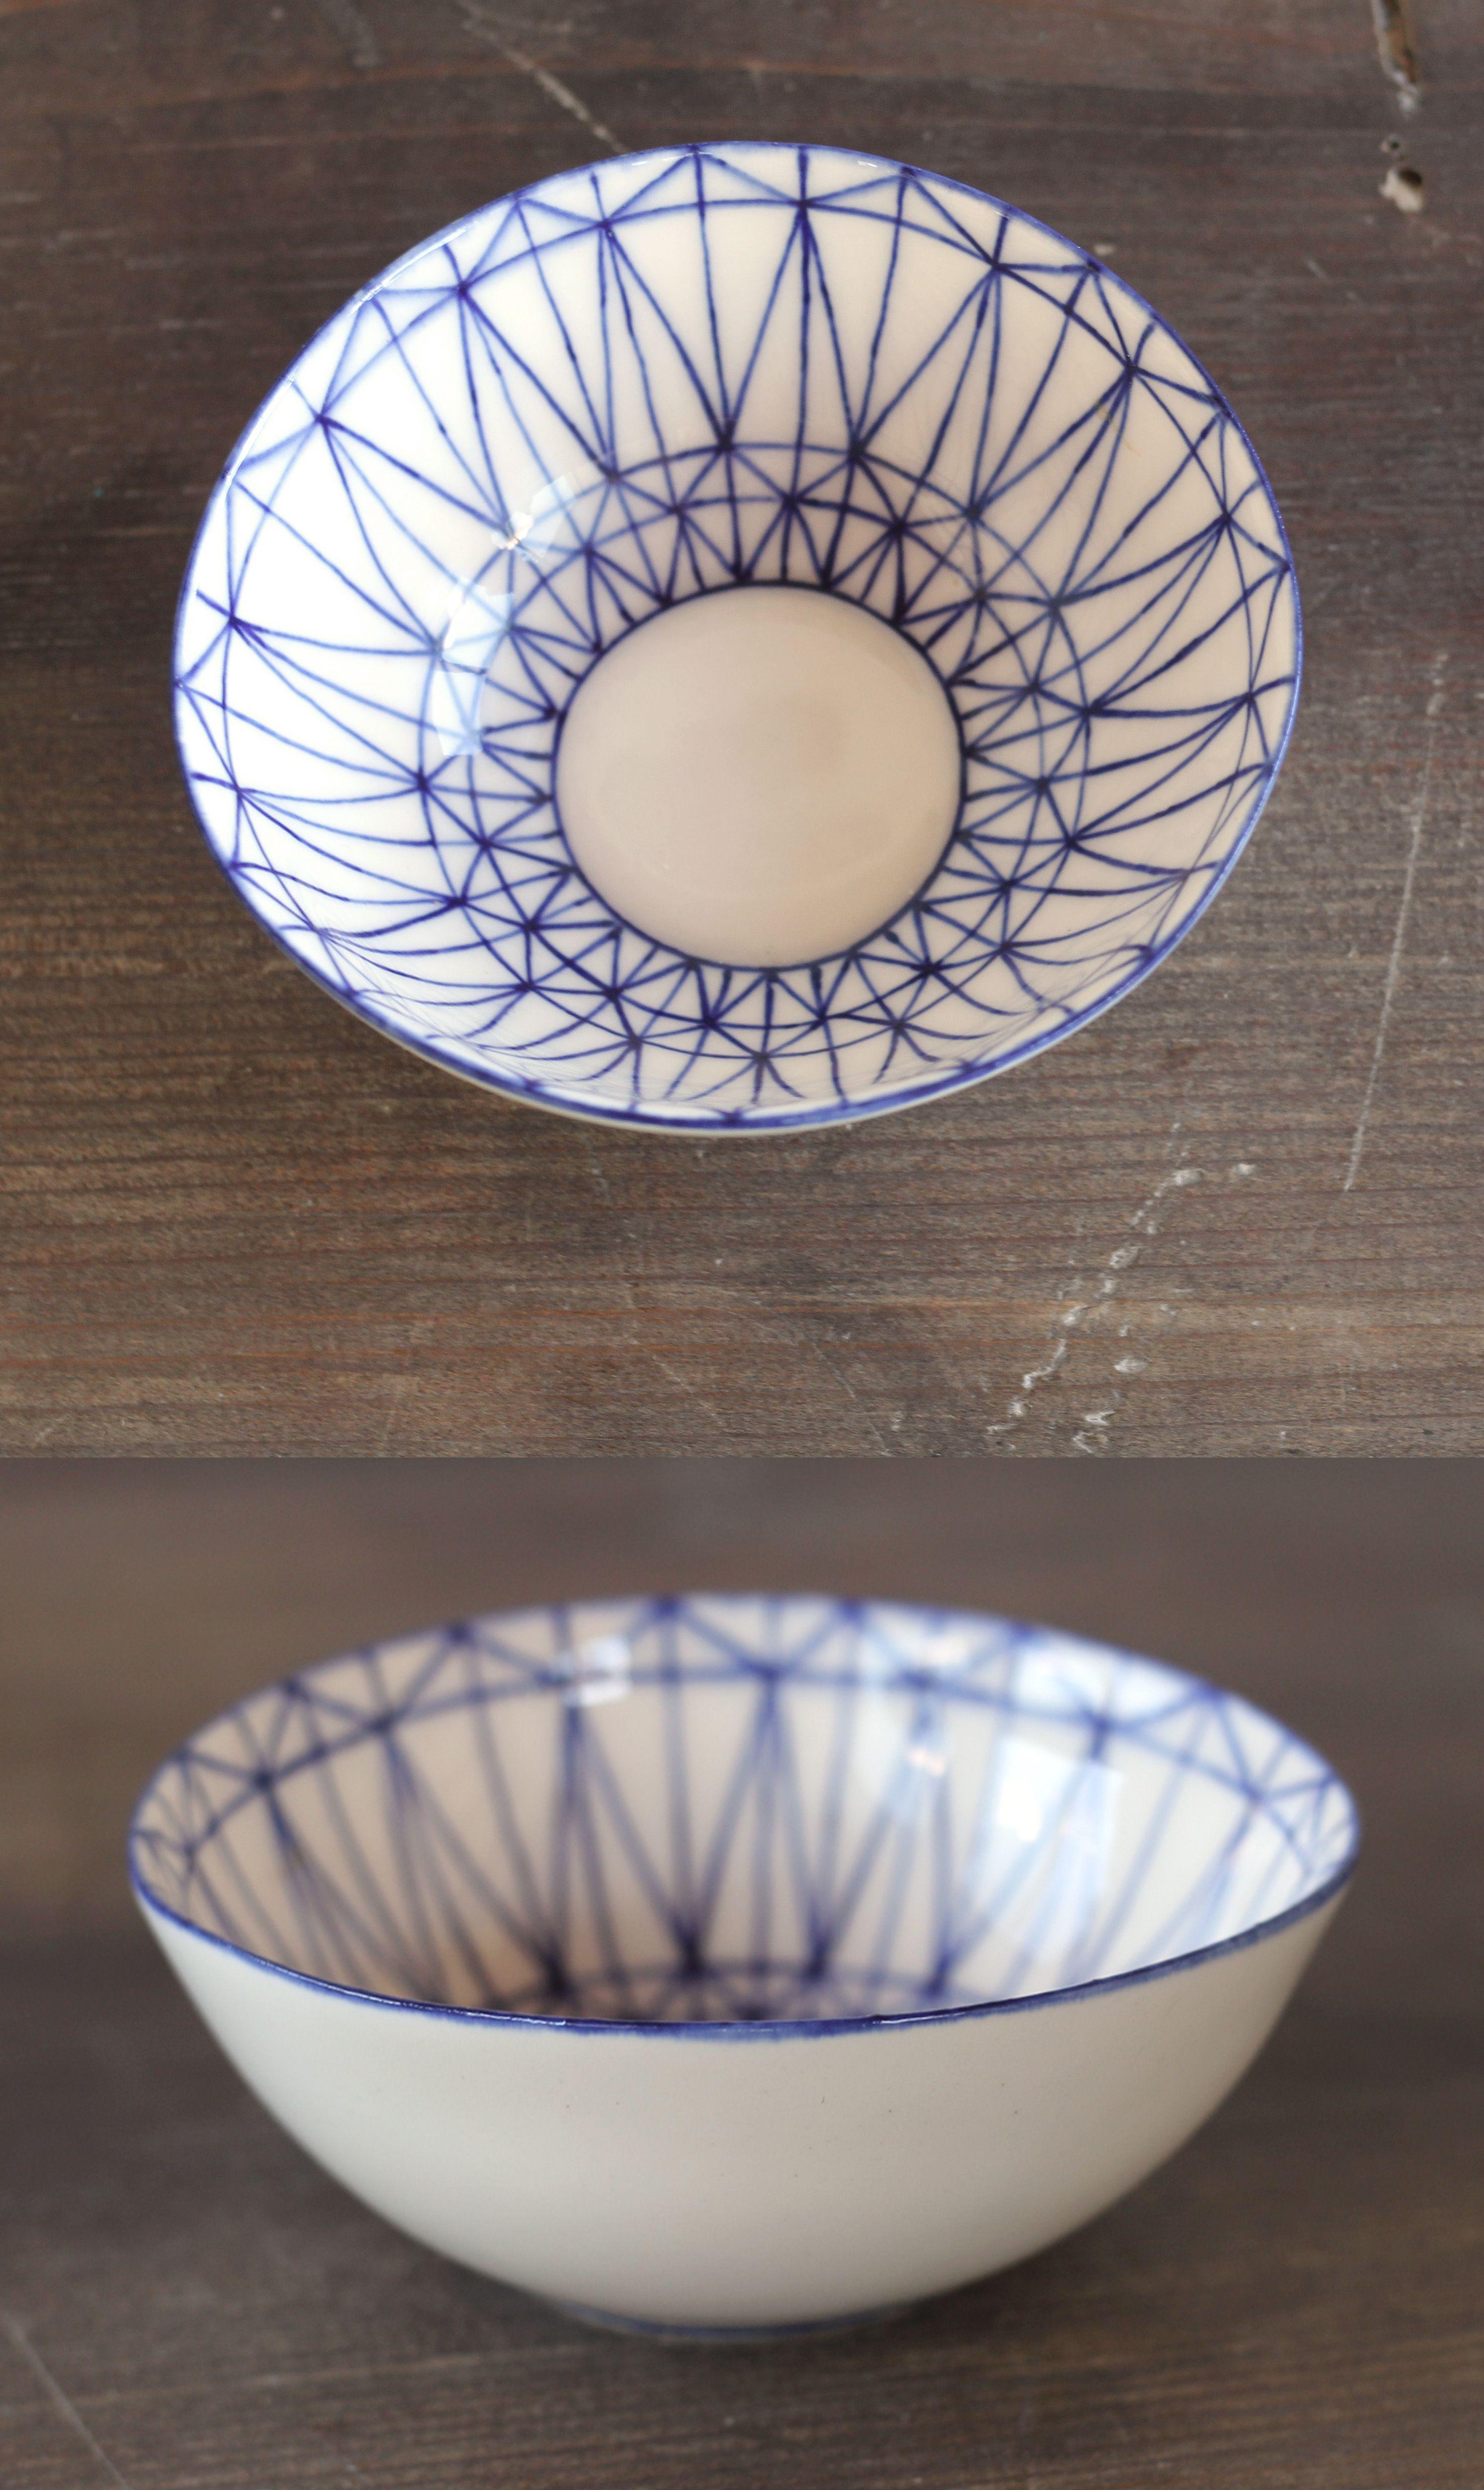 Unique hand-made pottery bowls, by Mădălina Teler